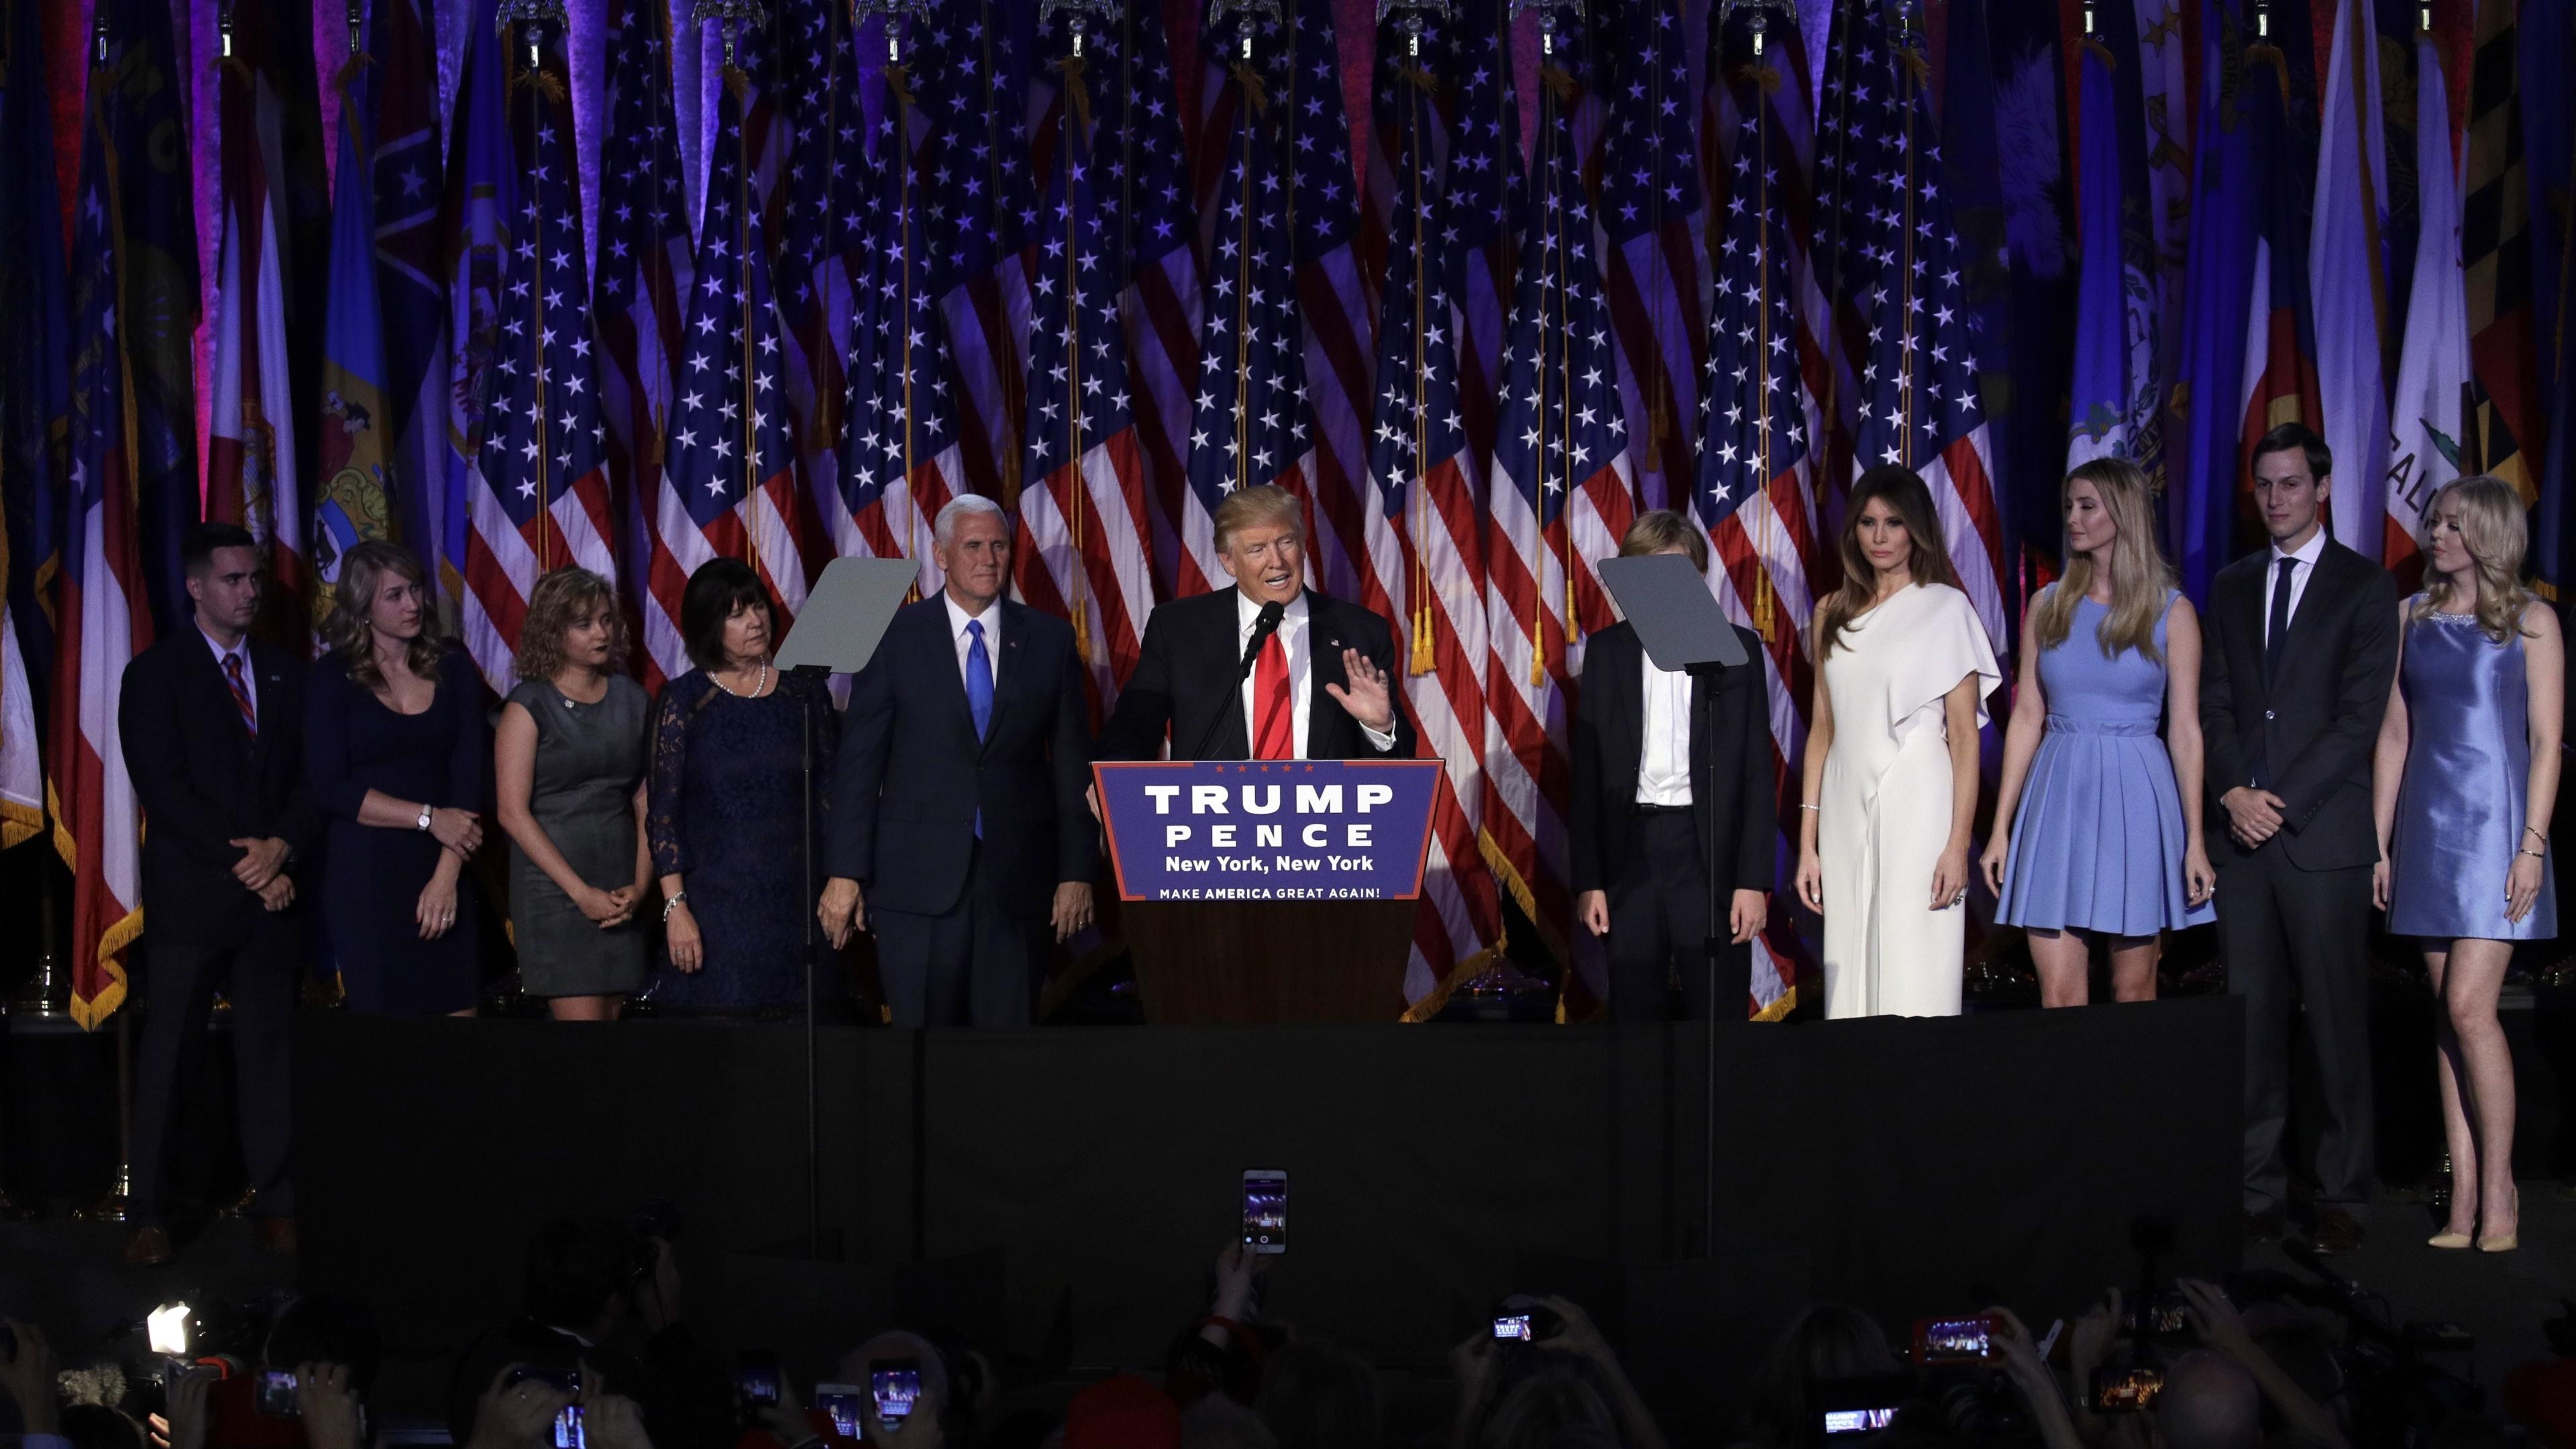 Trump's victory speech (PA)